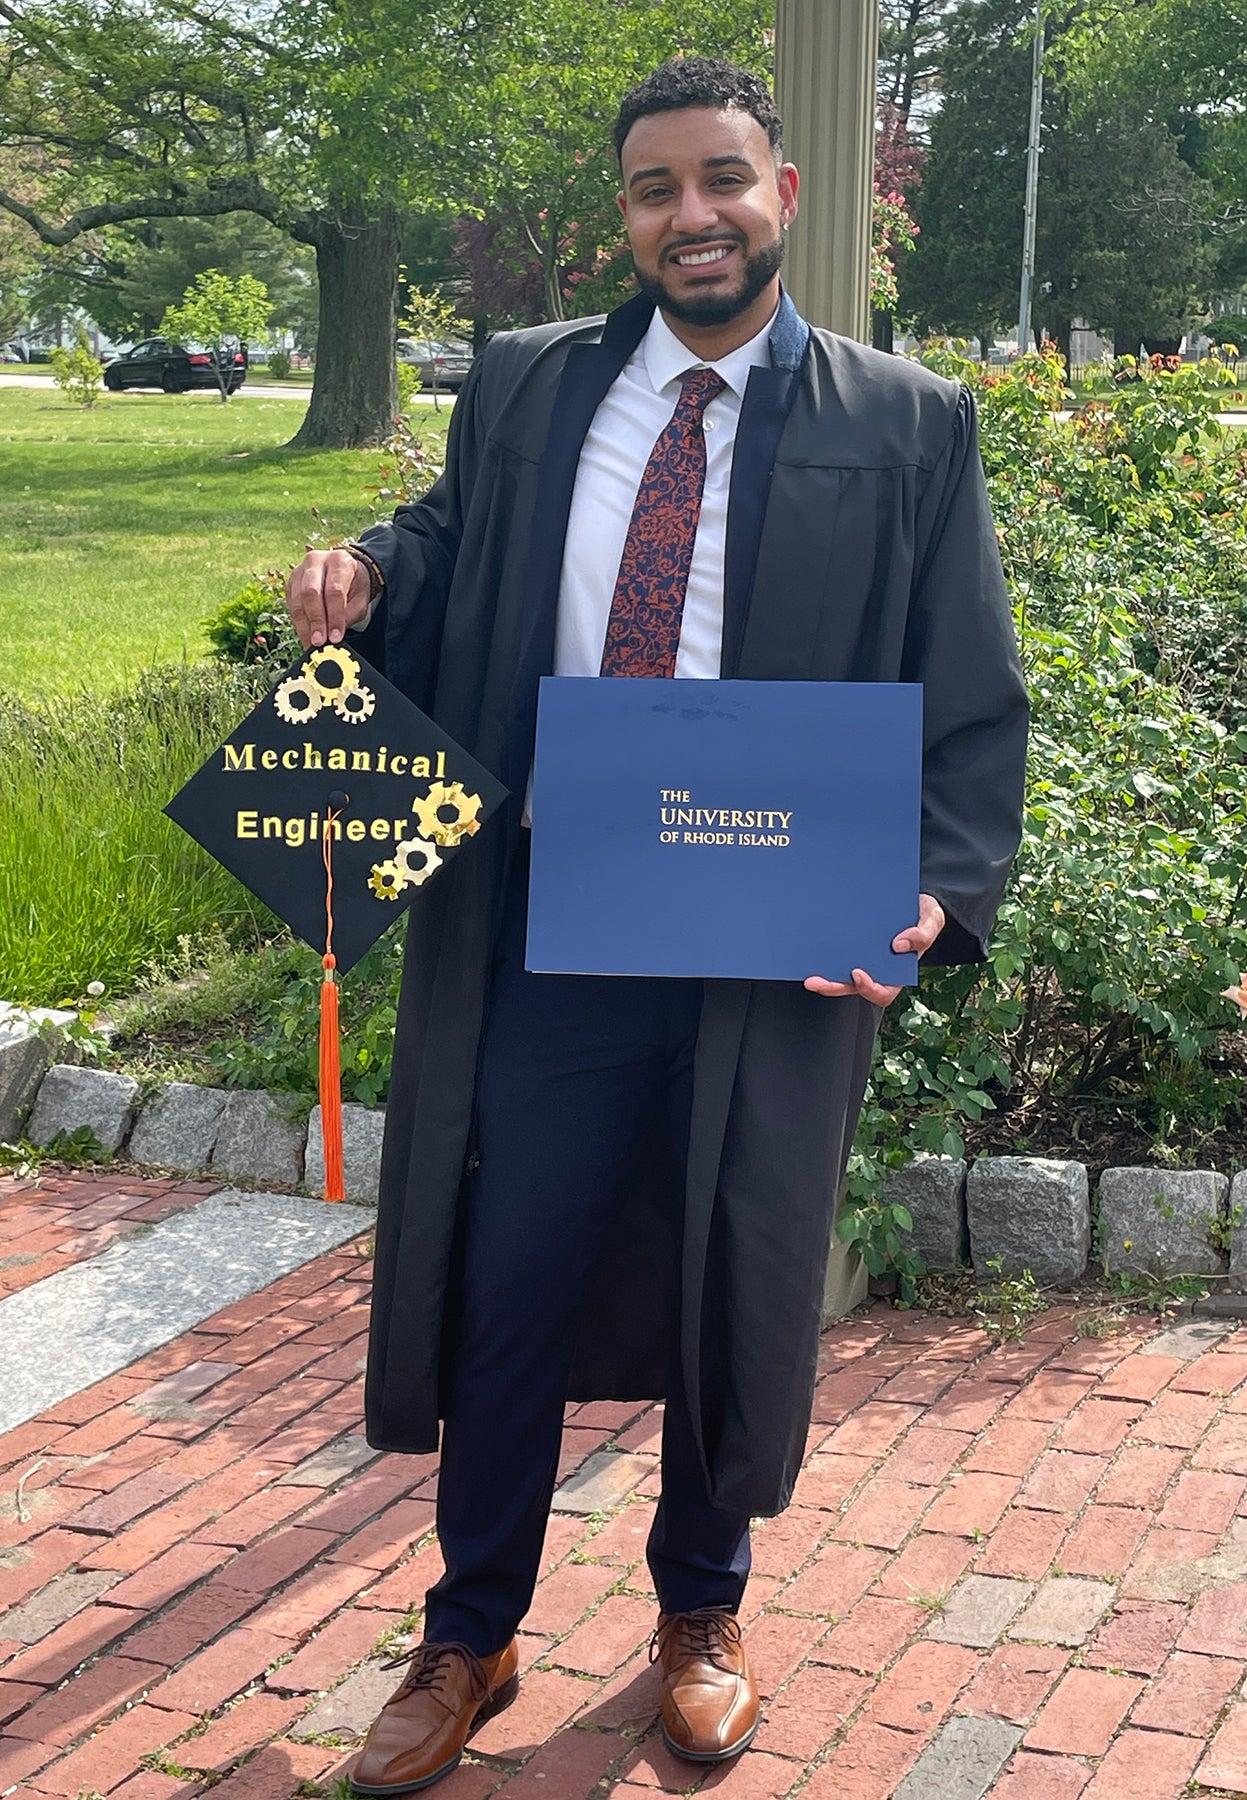 Jeancarlos Nolasco proudly displays his diploma